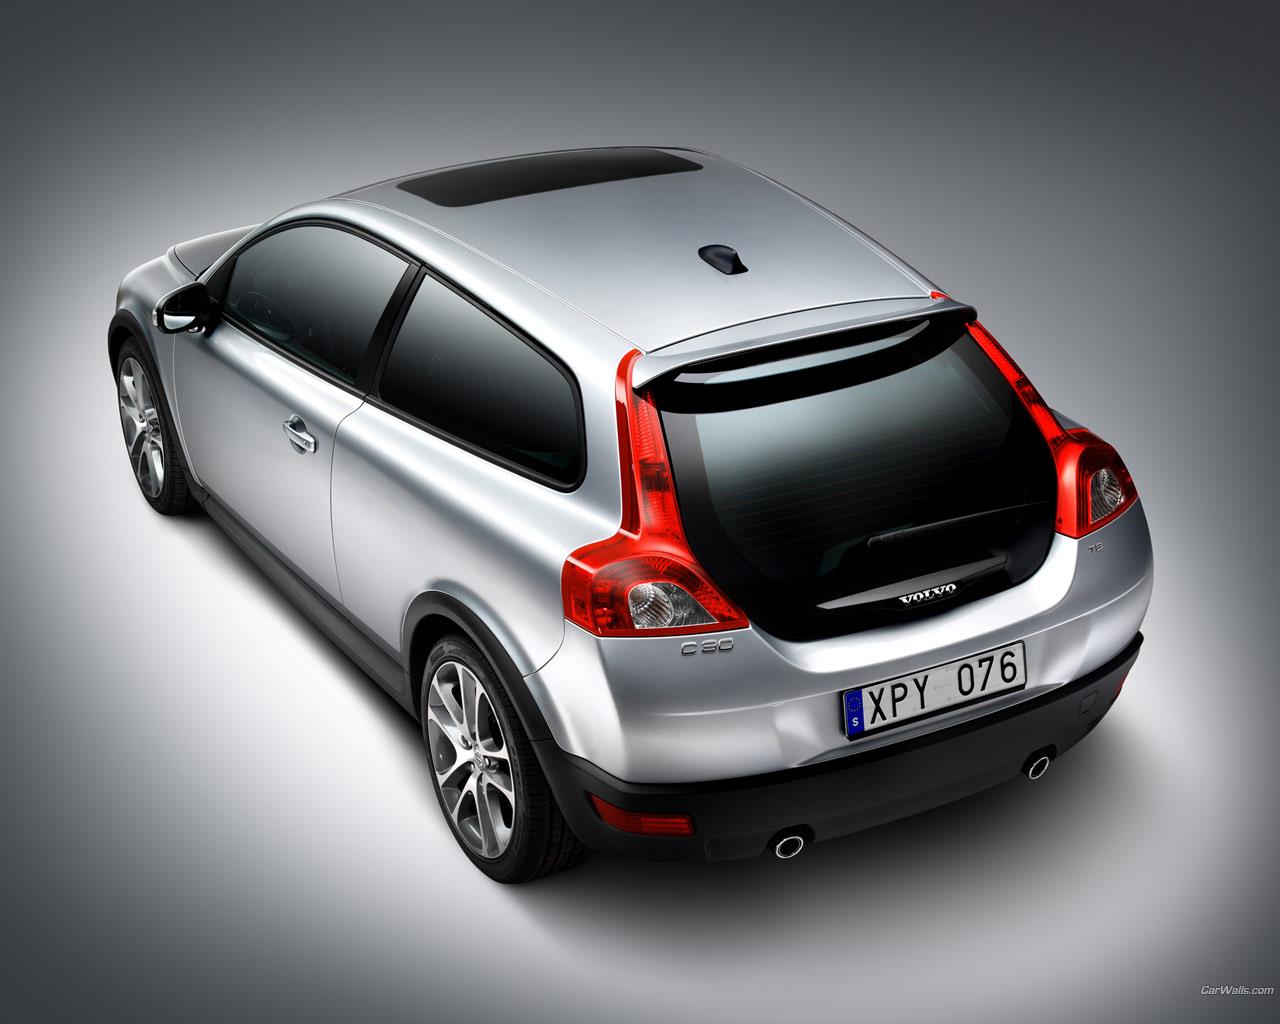 Image Result For Wallpaper Uk Sports Car